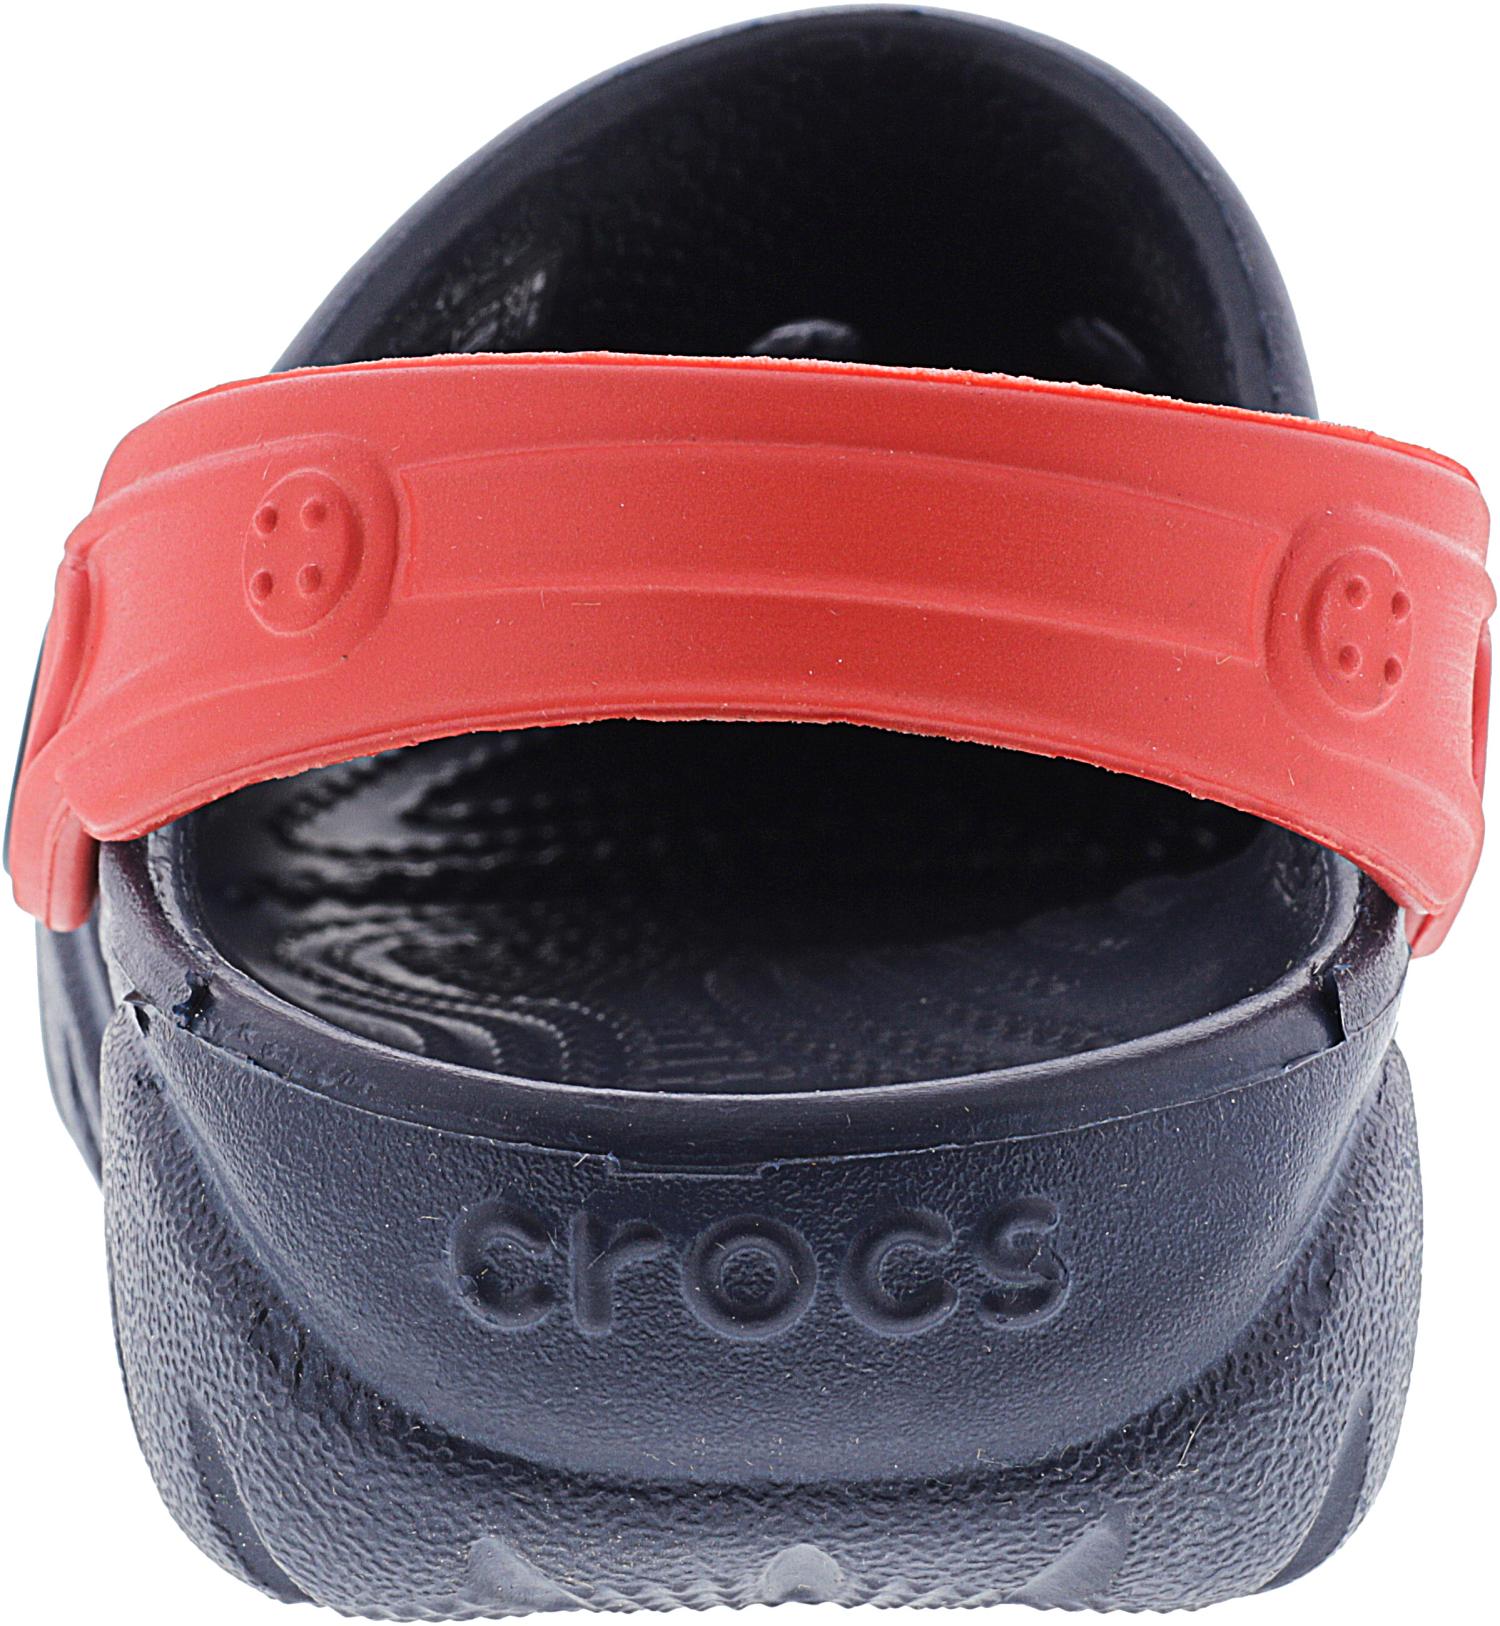 Crocs-Kids-Swiftwater-Clog-Ltd-Ankle-High-Clogs Indexbild 15